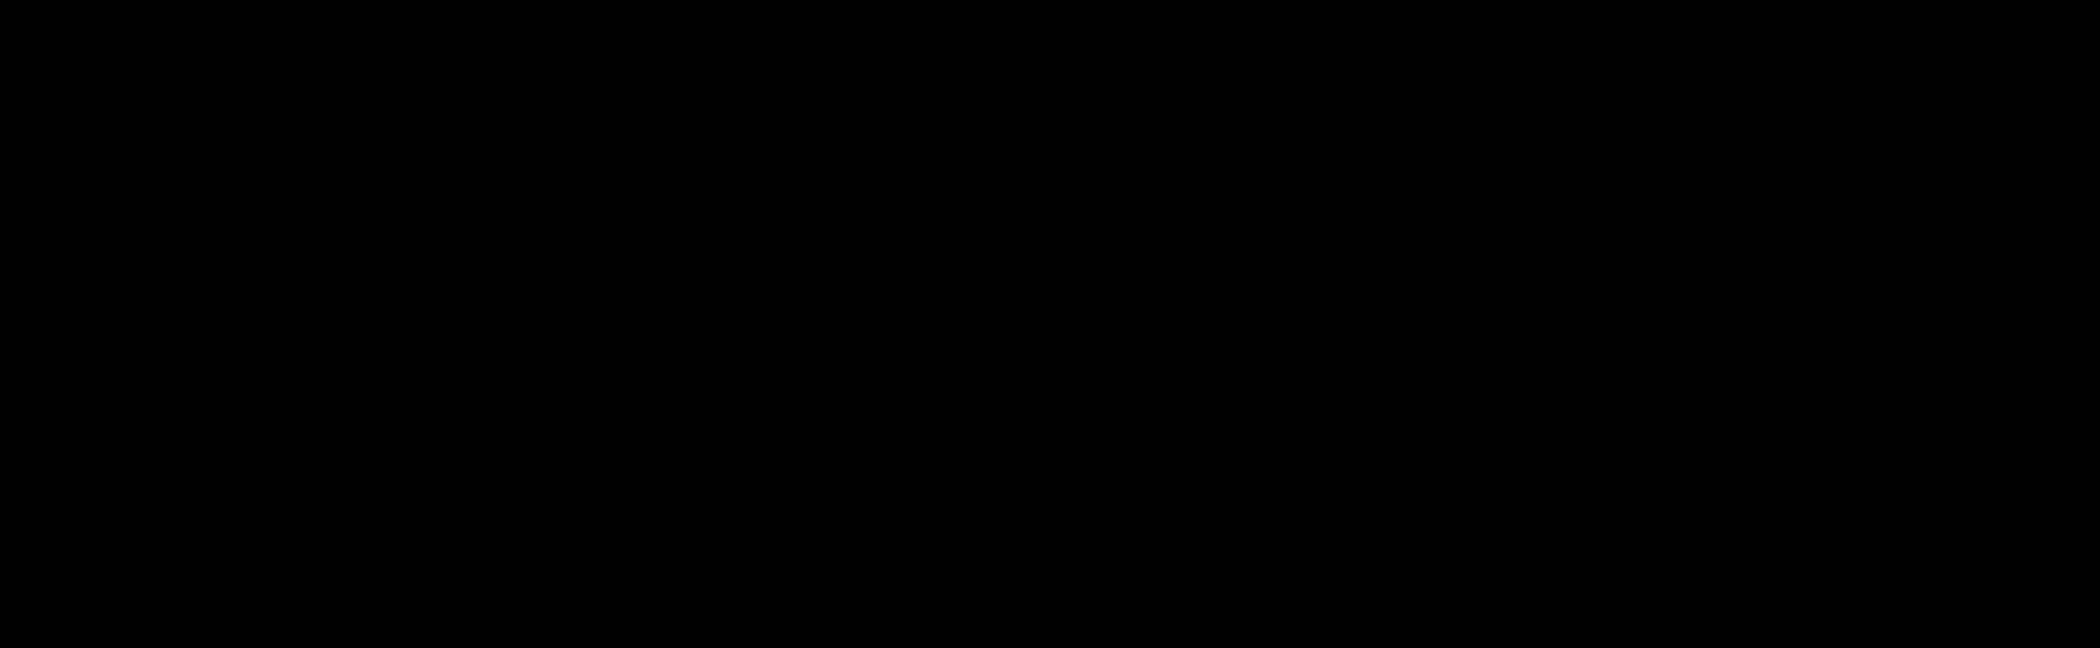 Aripiprazole EP impurity C